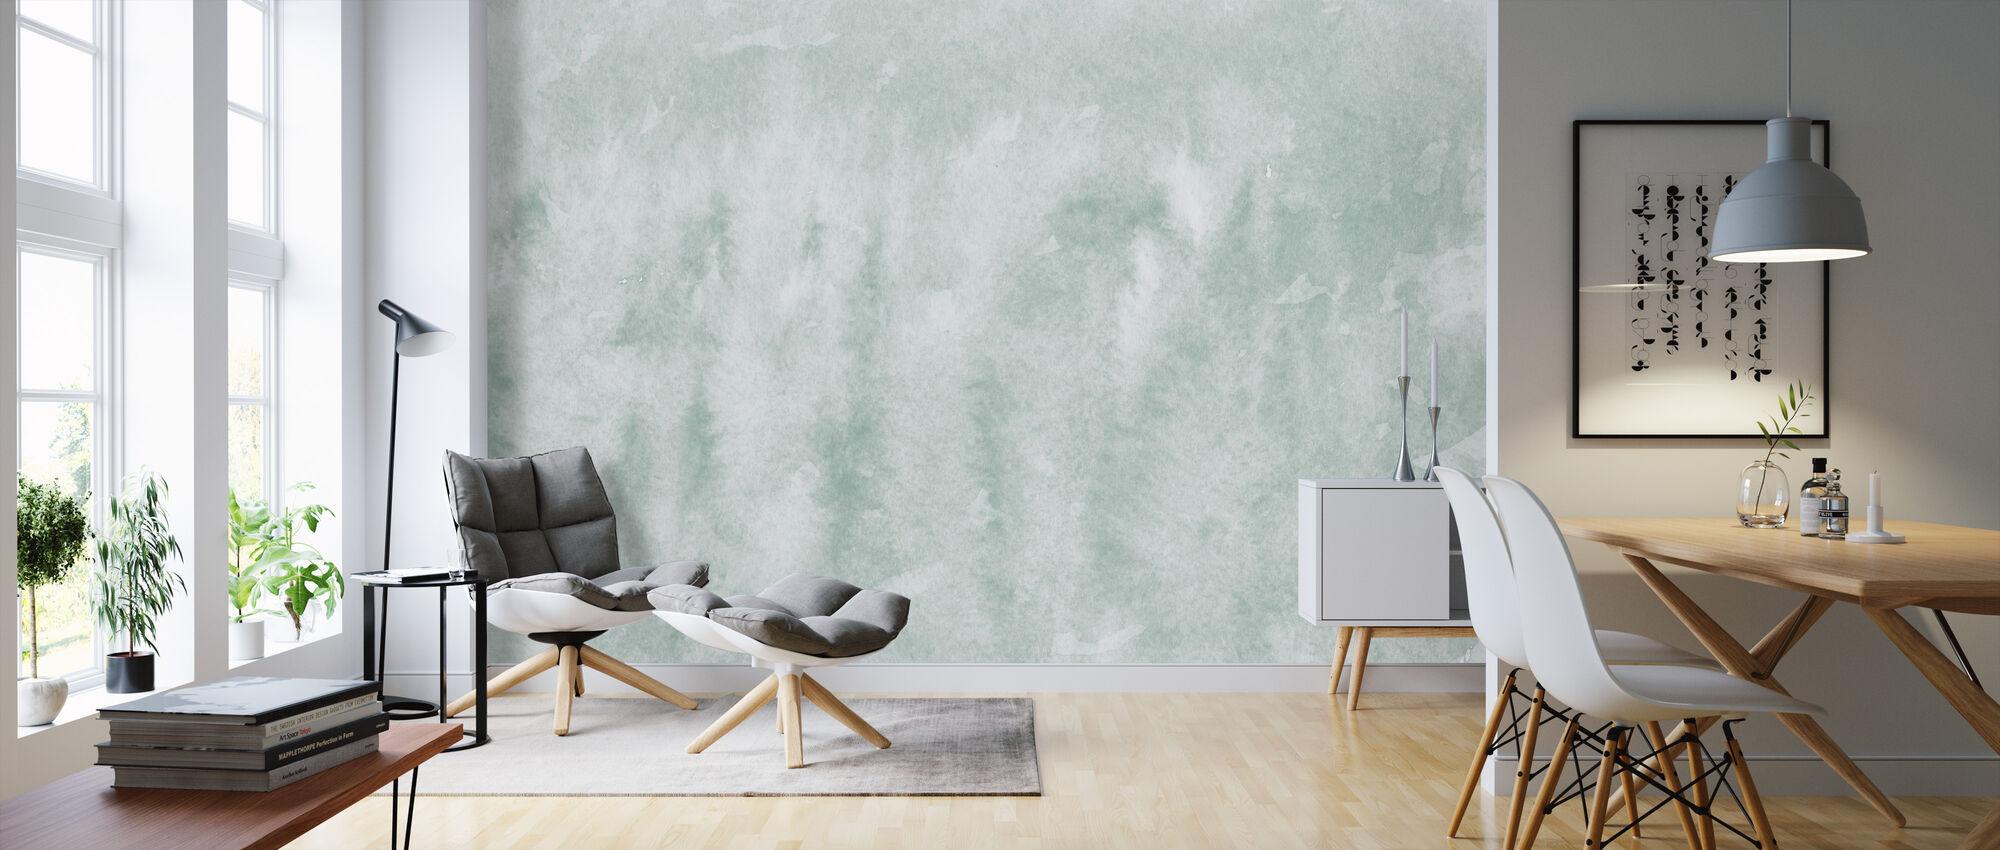 Watercolor Minimalism XX - Wallpaper - Living Room